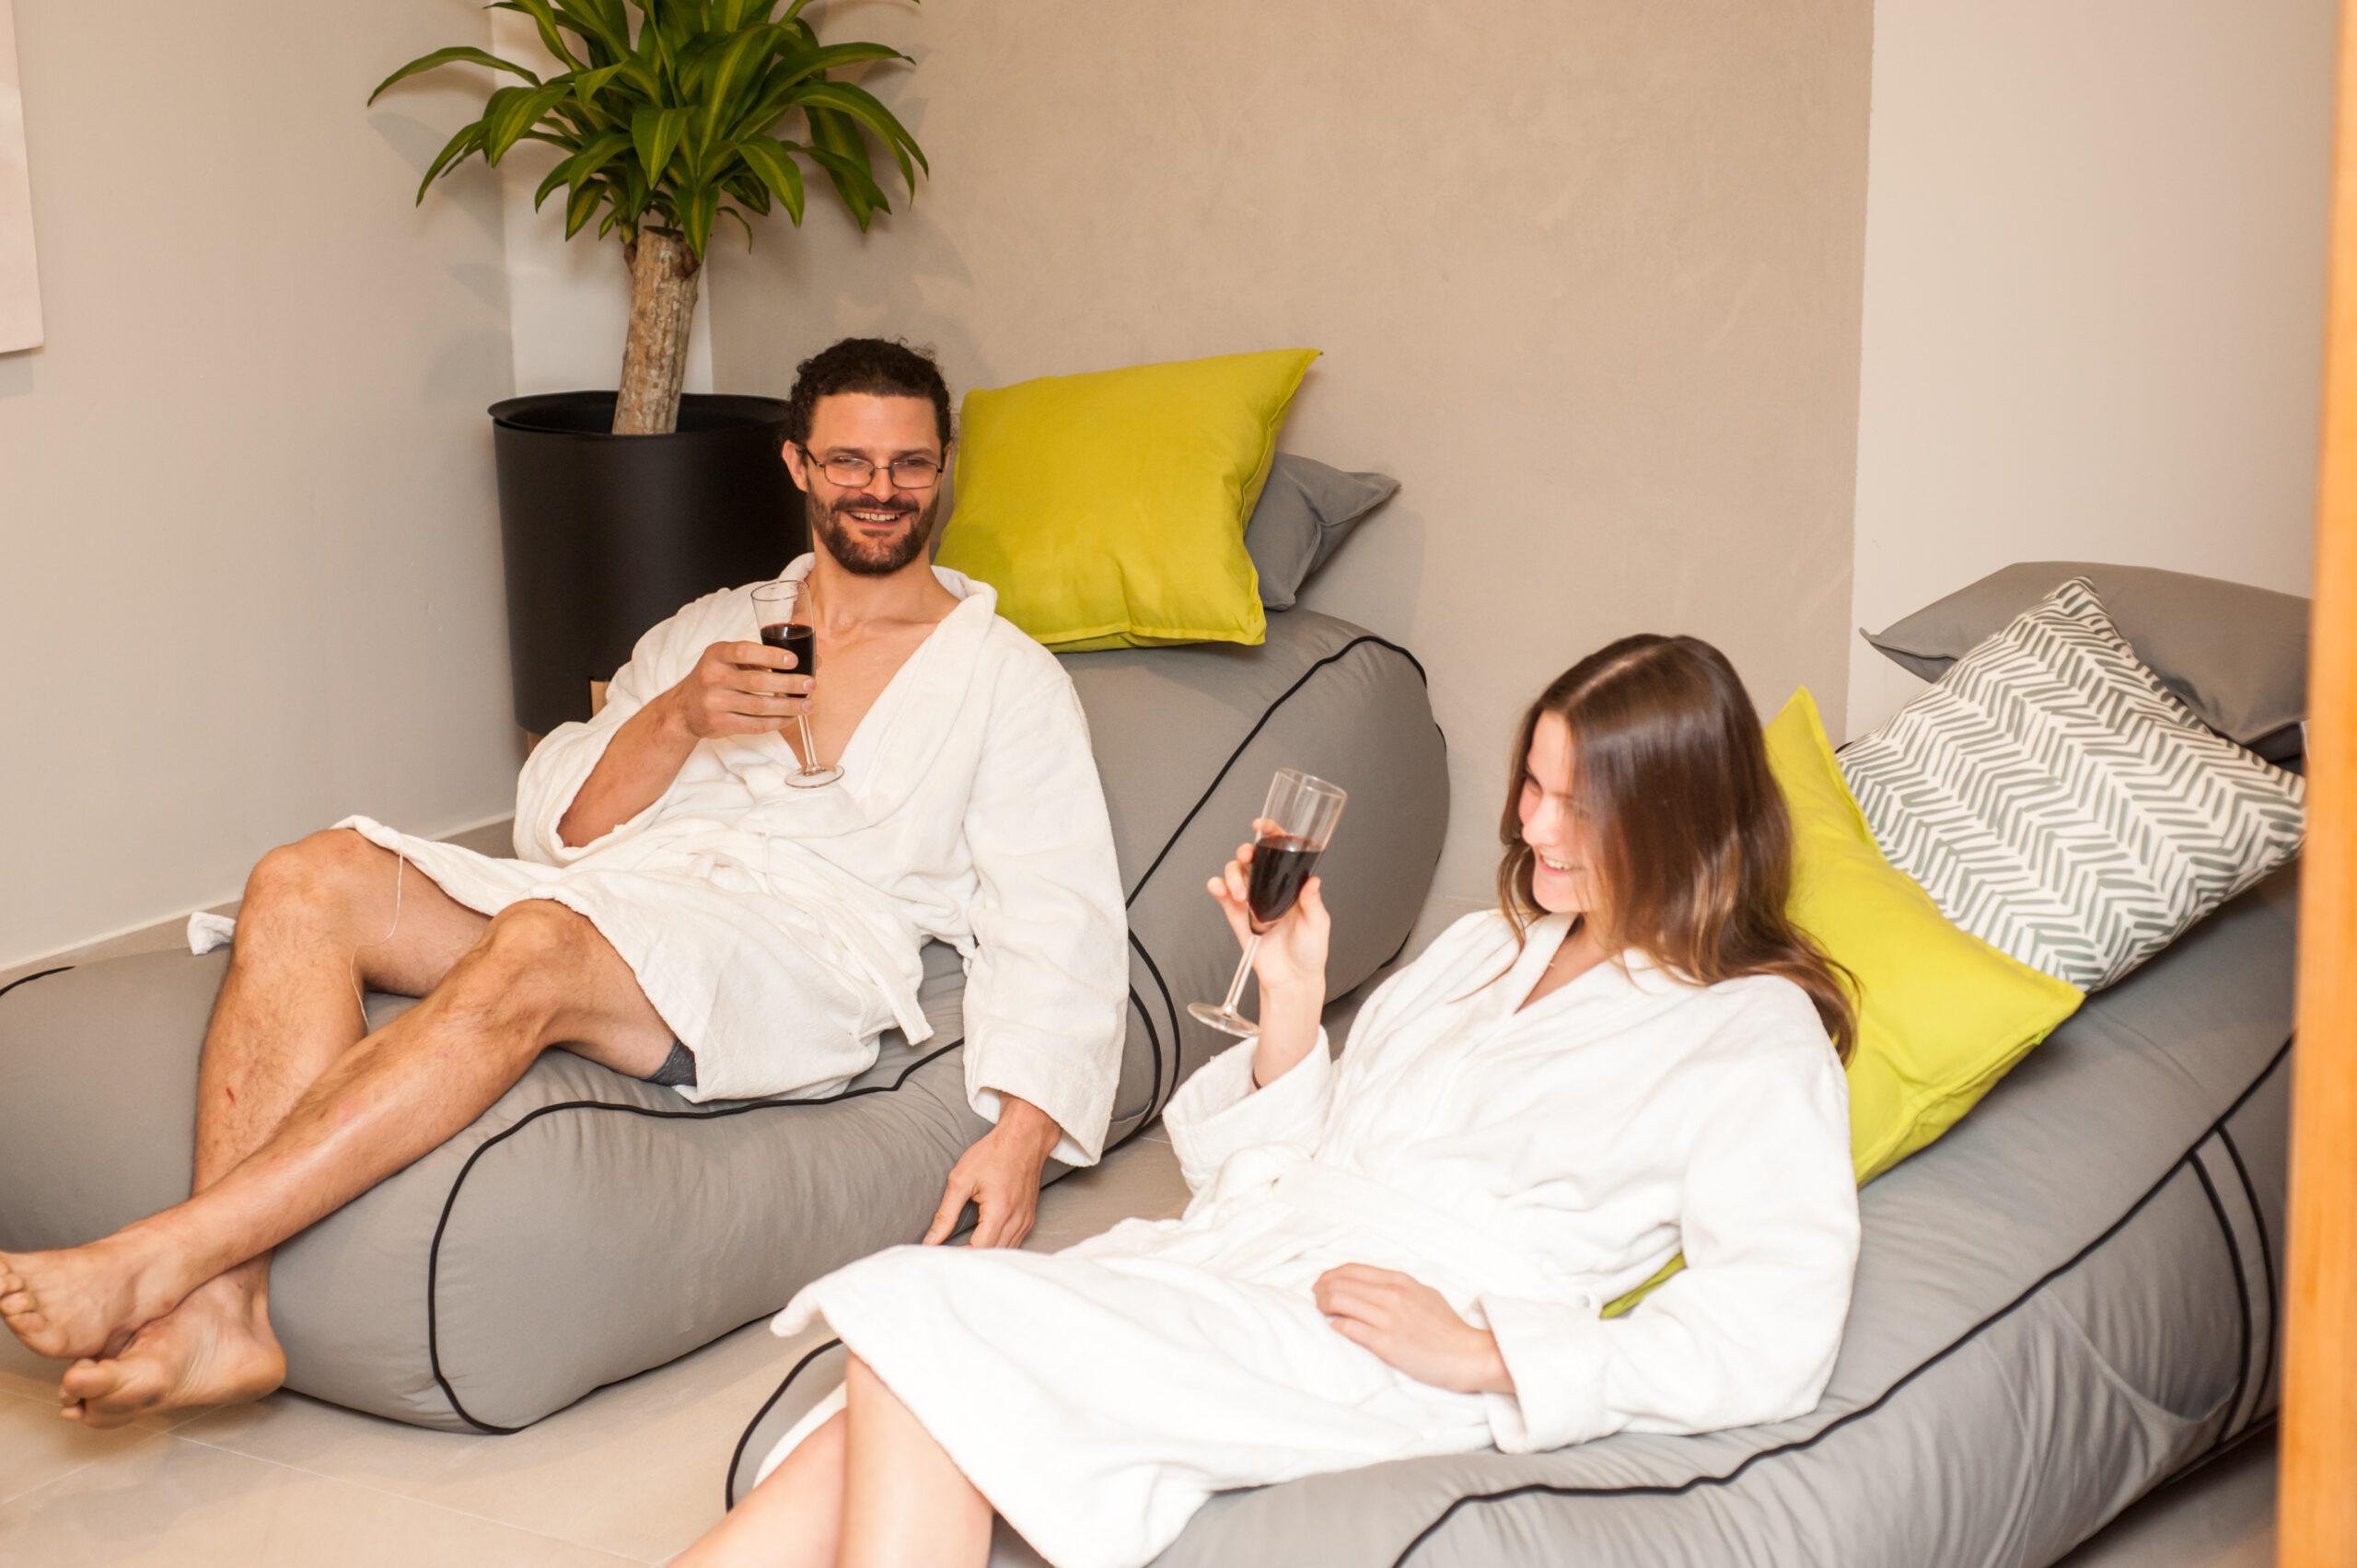 Evergreen Spa Relaxation Room Brisbane Bathhouse